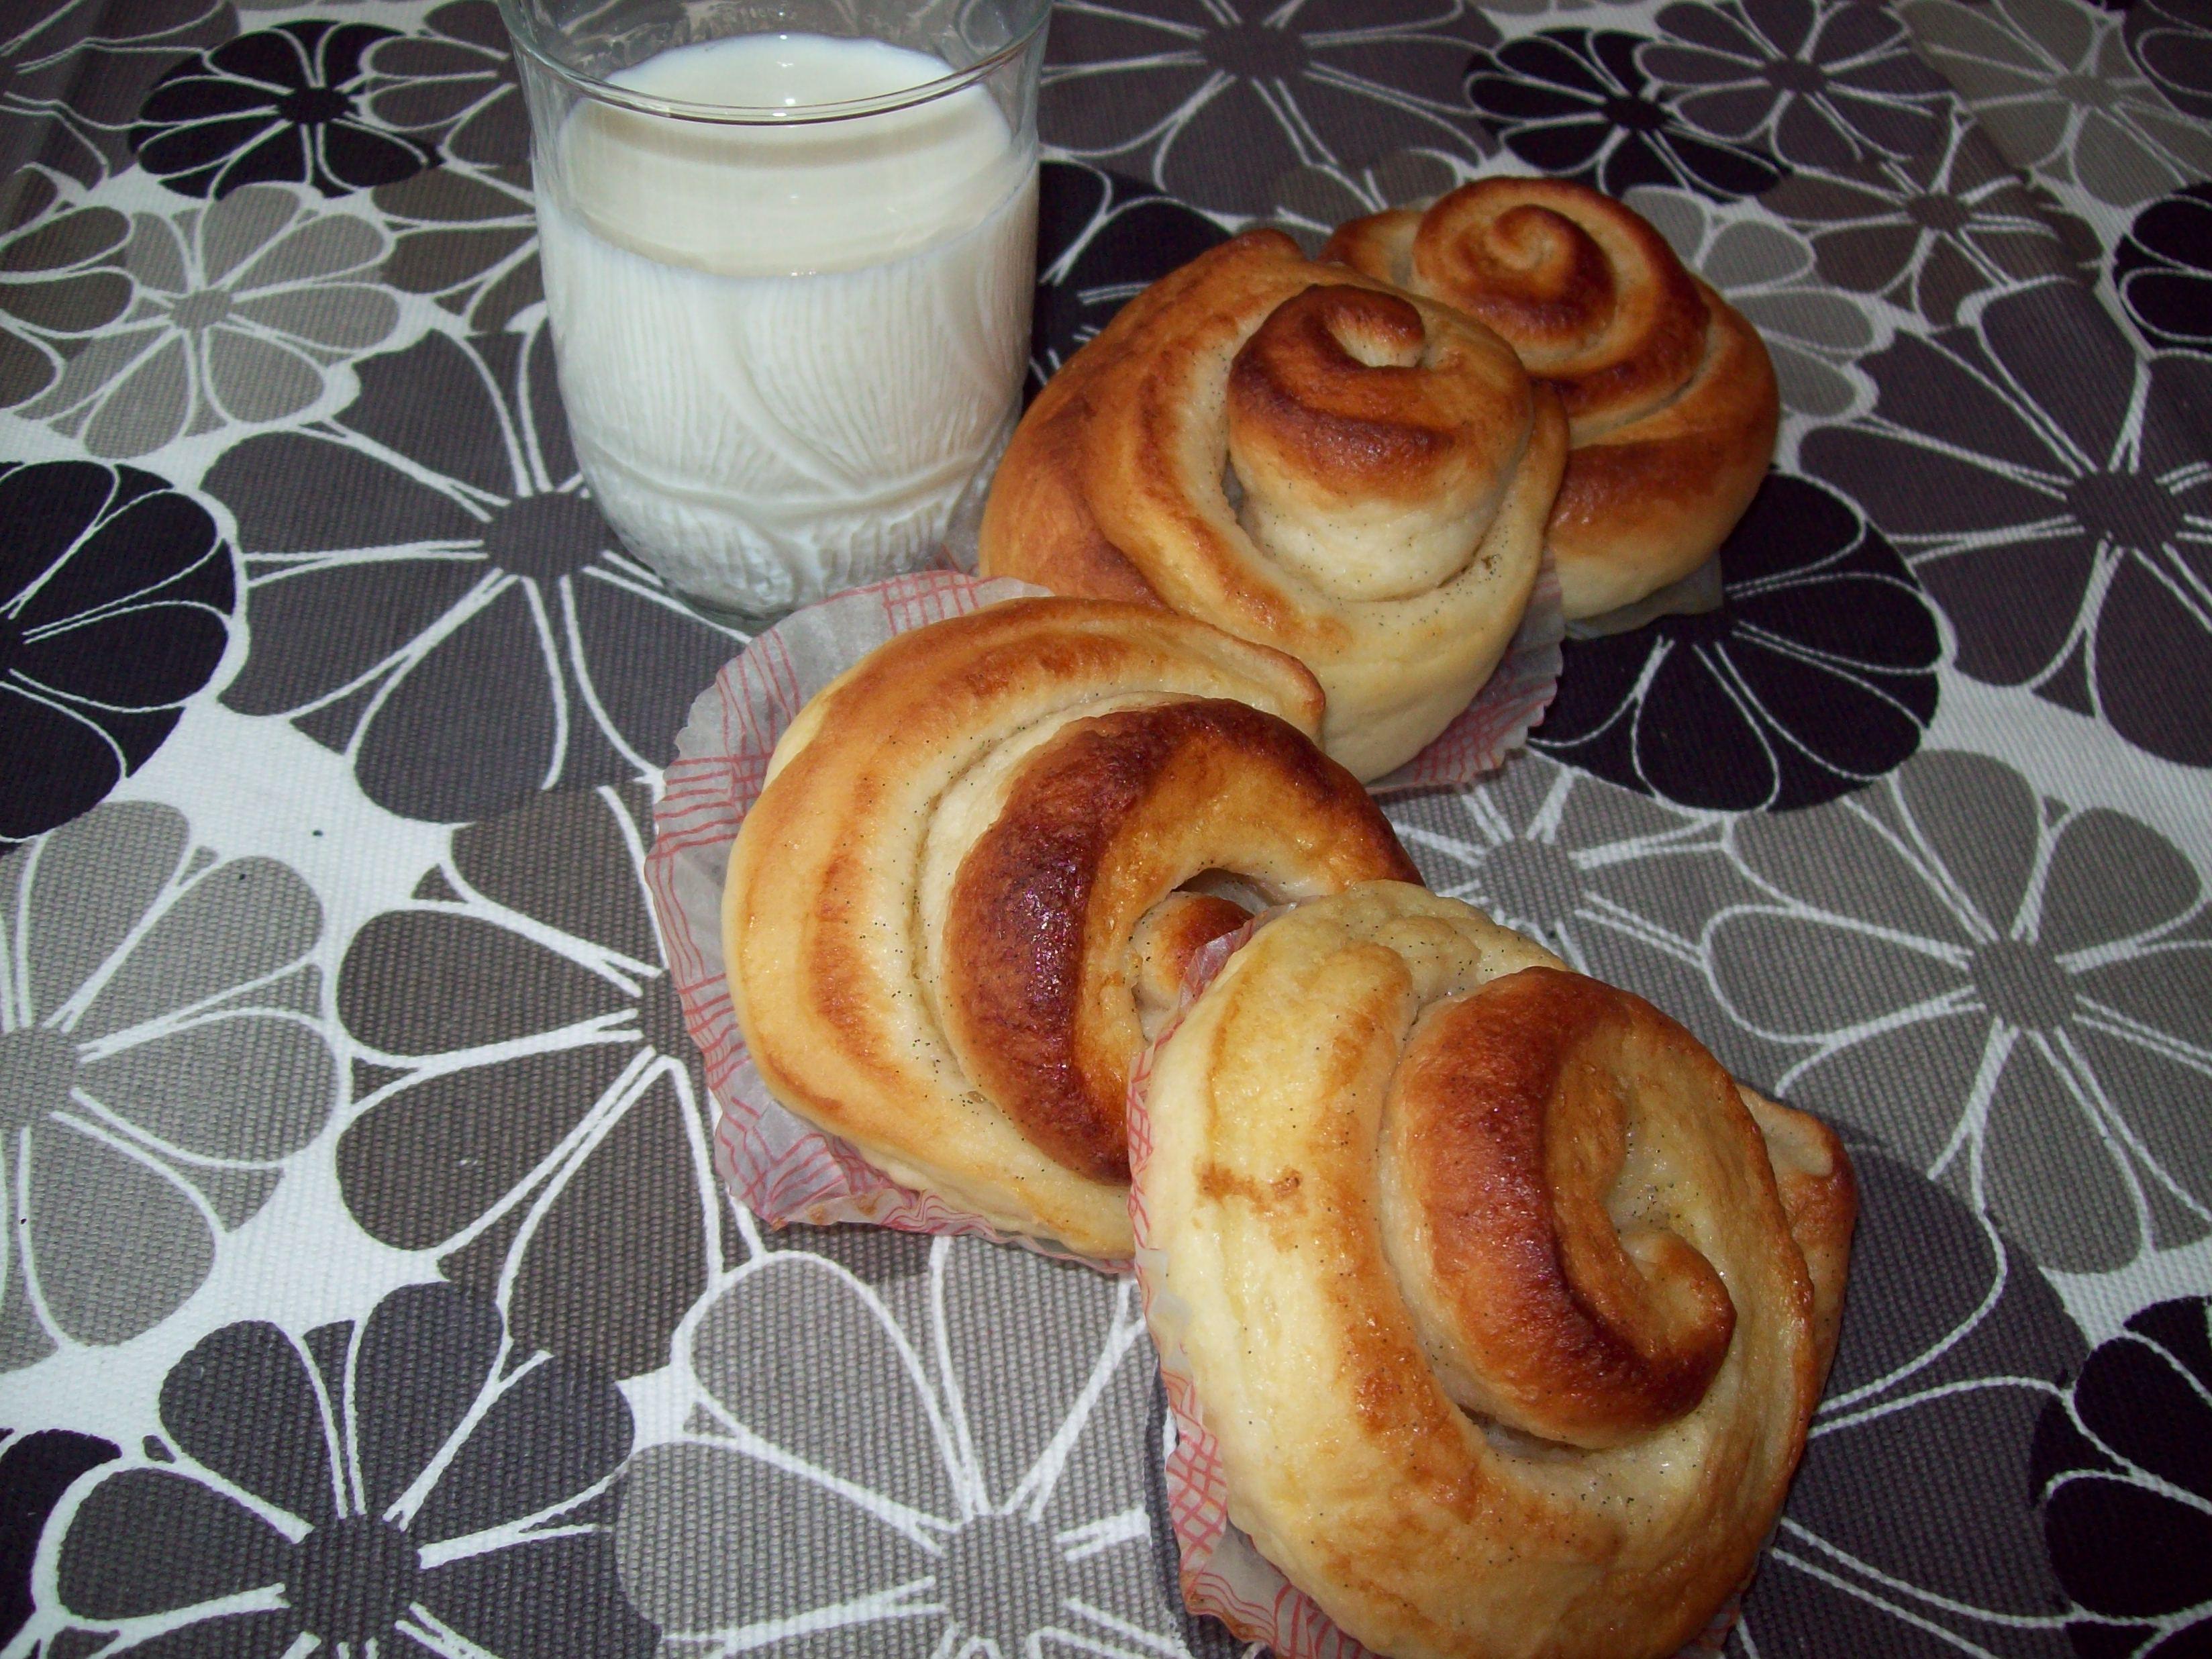 vaniljbullar äkta vaniljstång